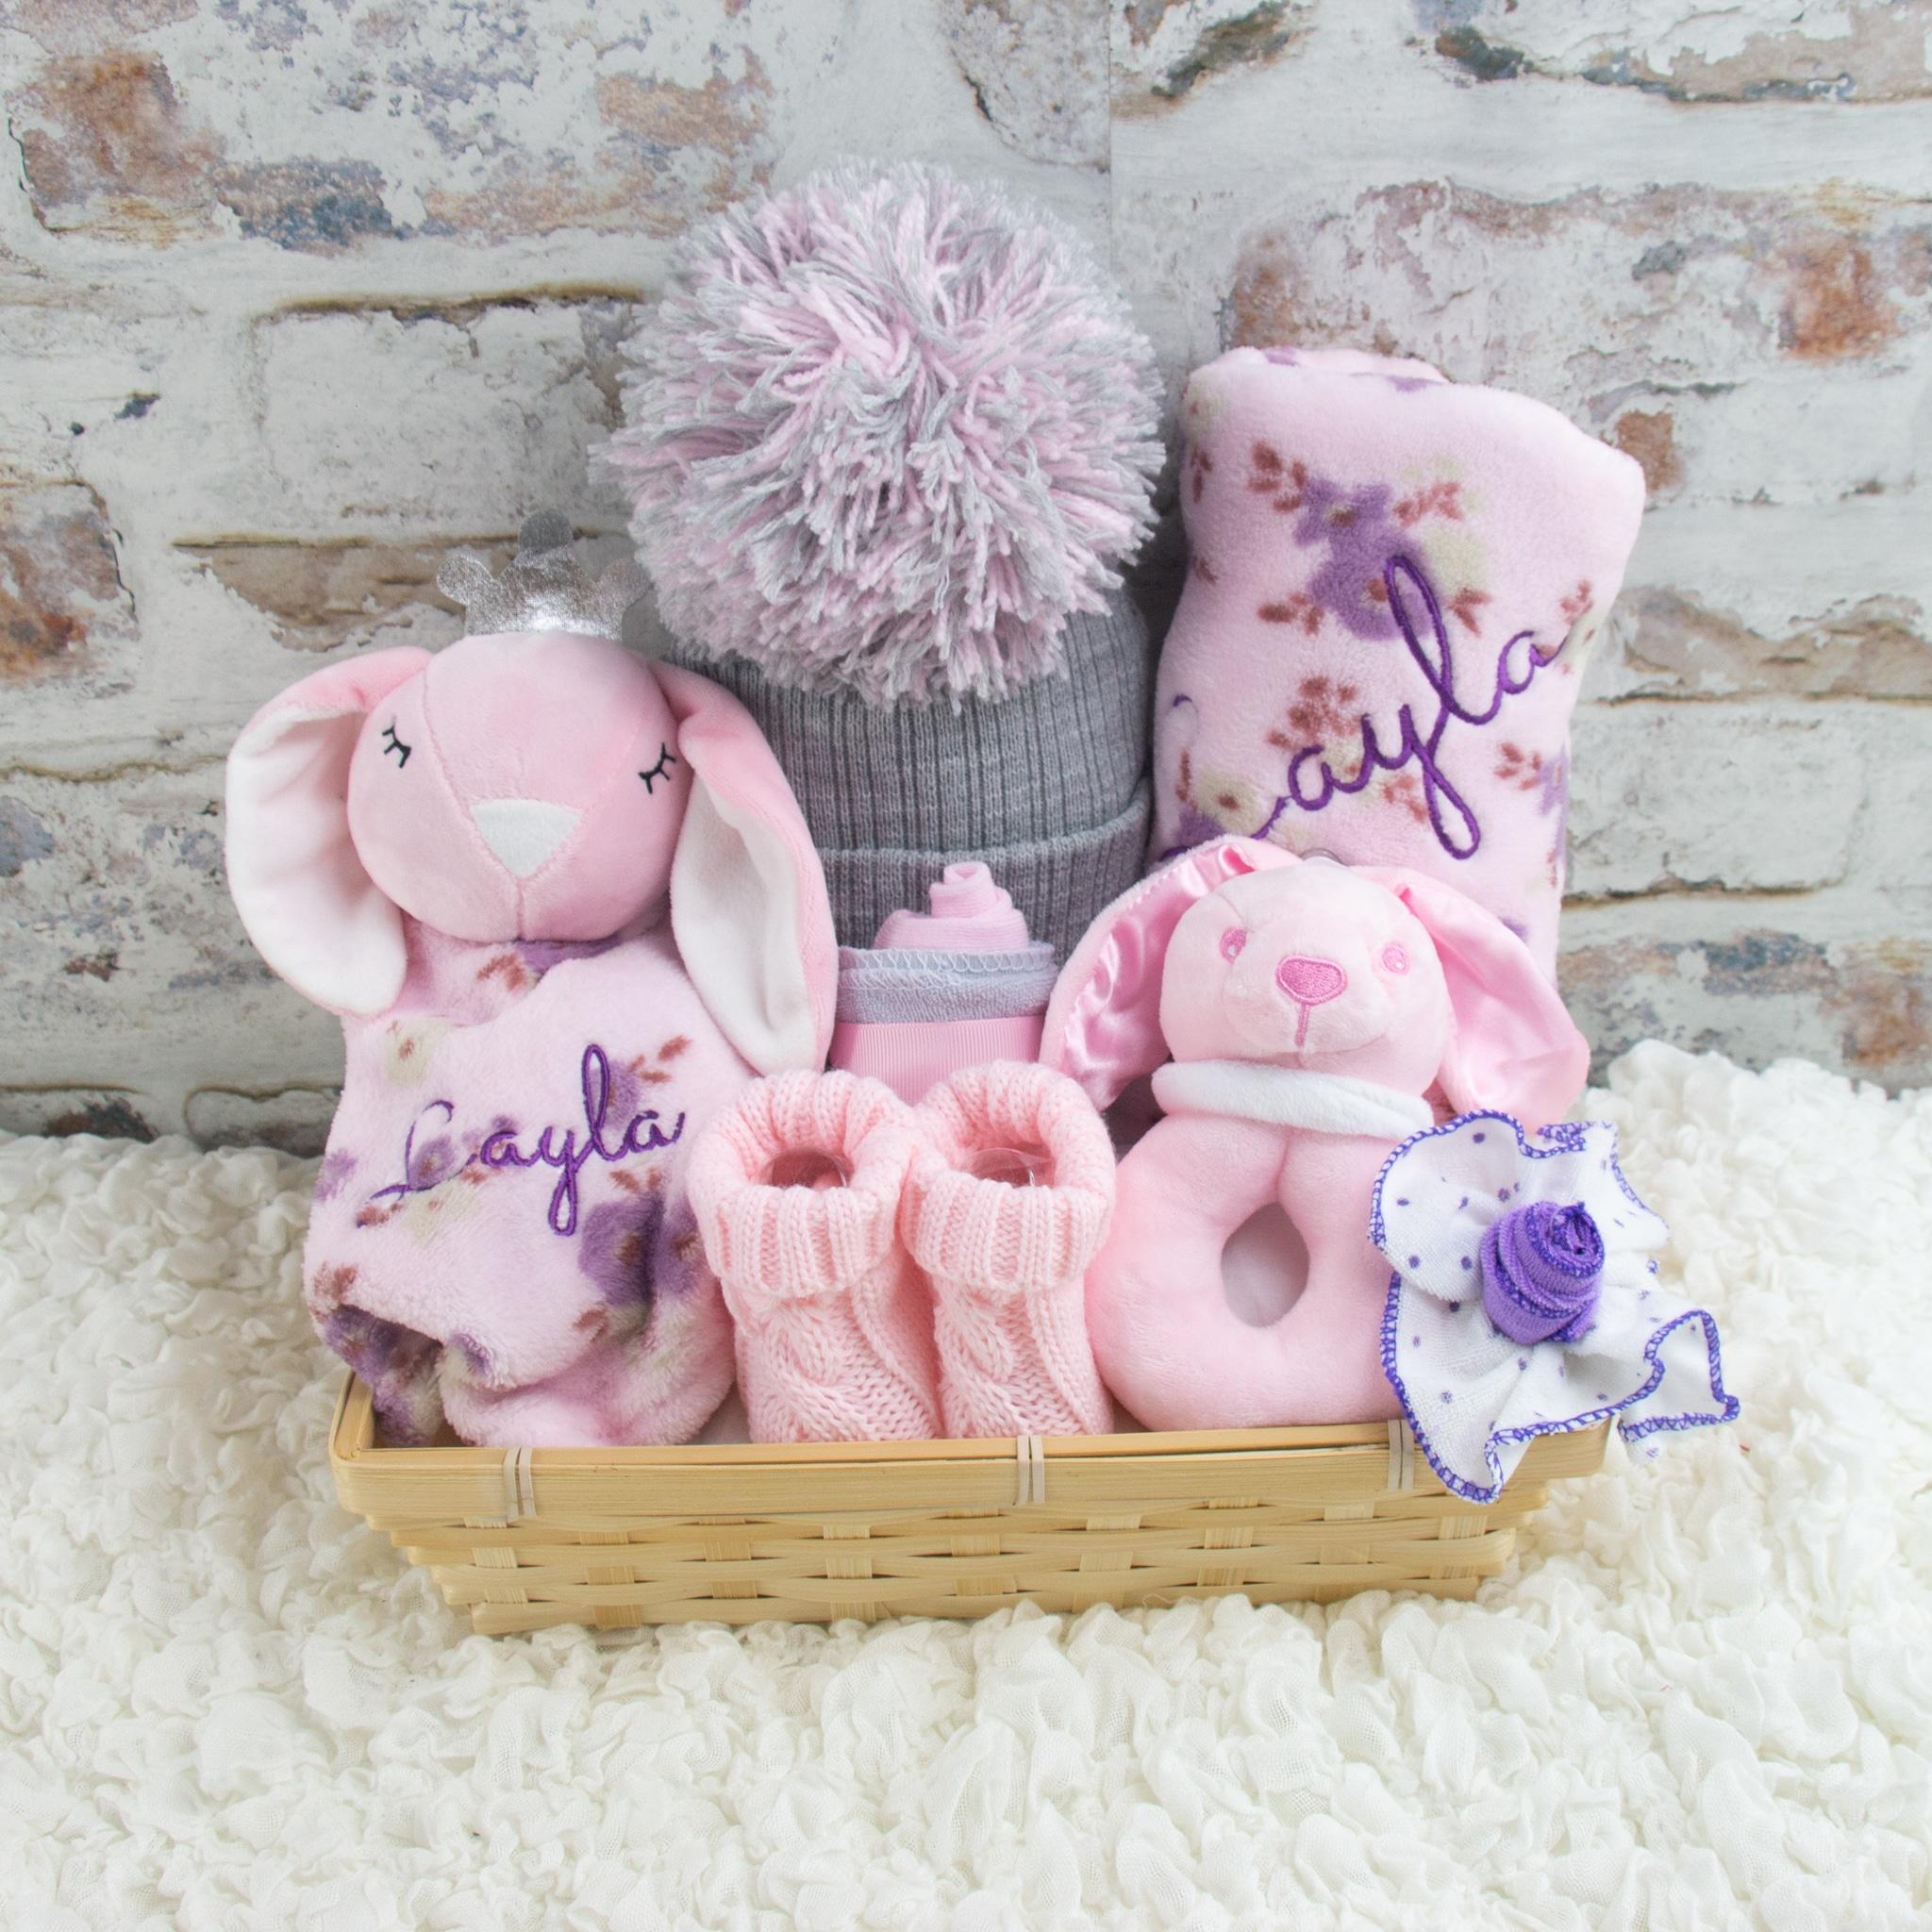 Personalised new baby girl bunny rabbit gift hamper